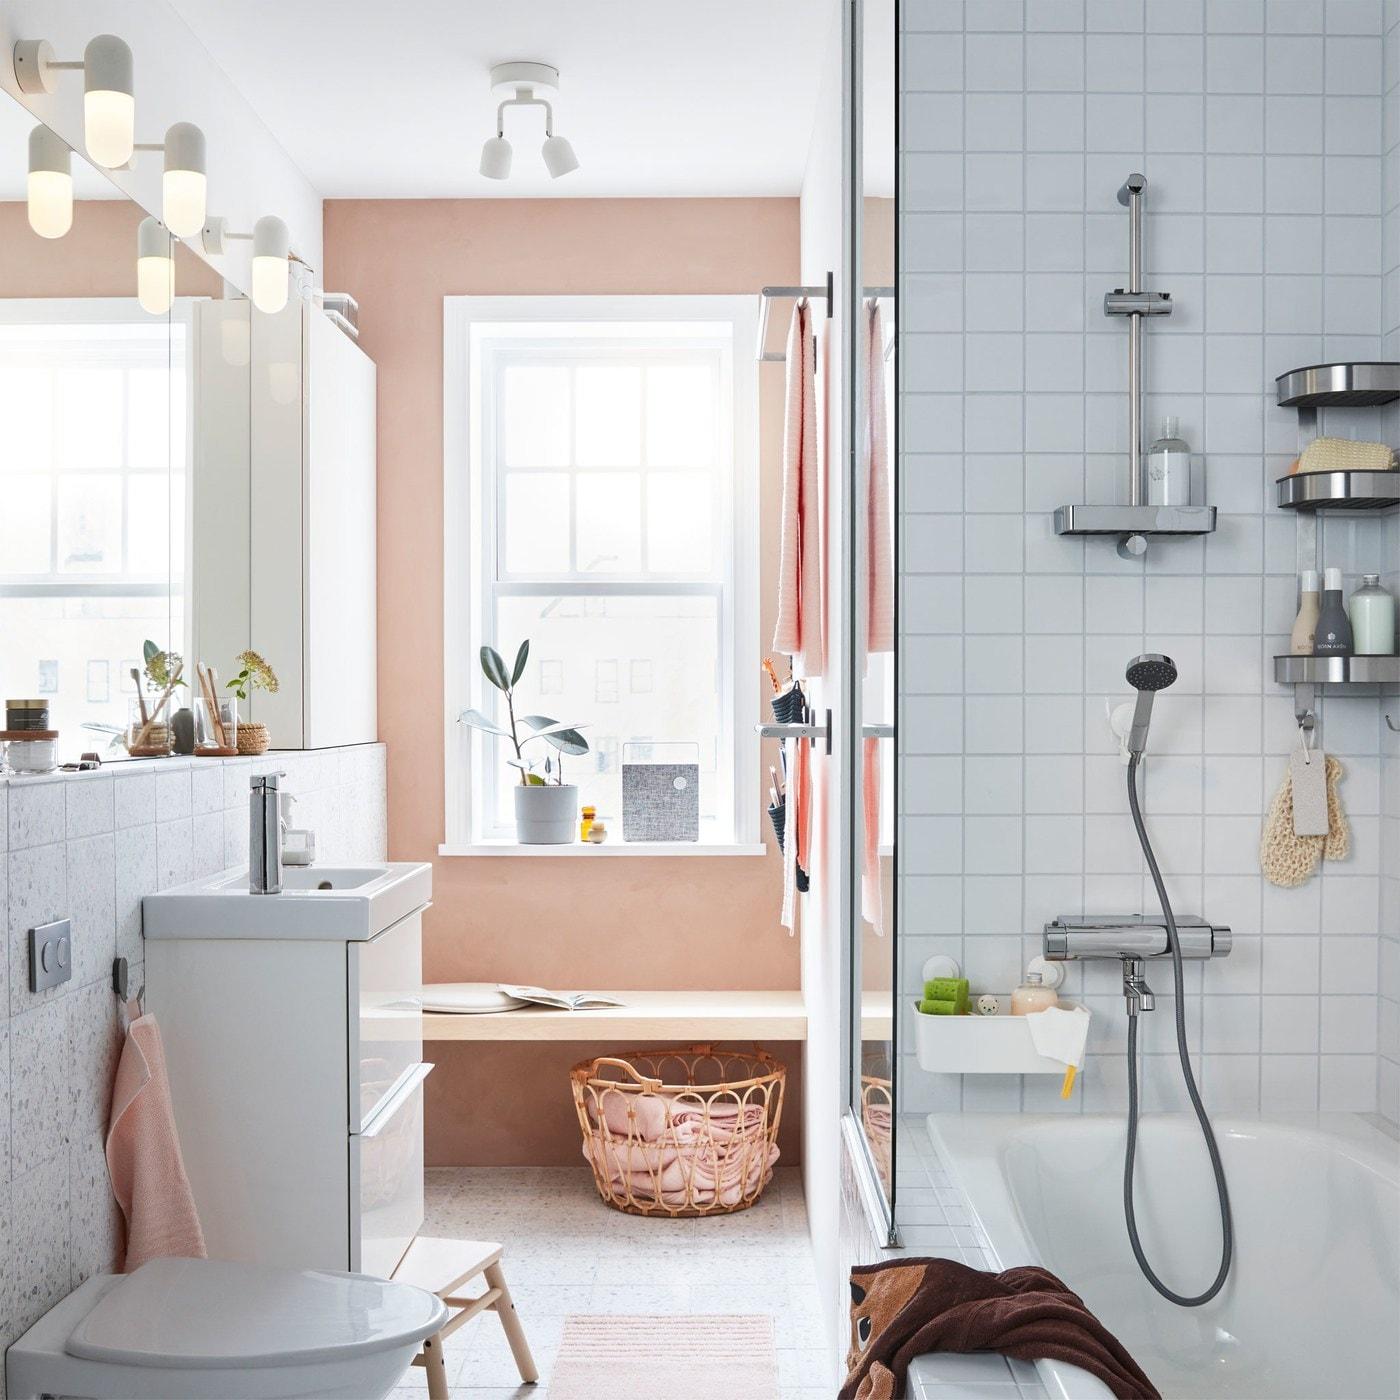 Renovate Your Bathroom - Tips And Tricks  IKEA Egypt - IKEA